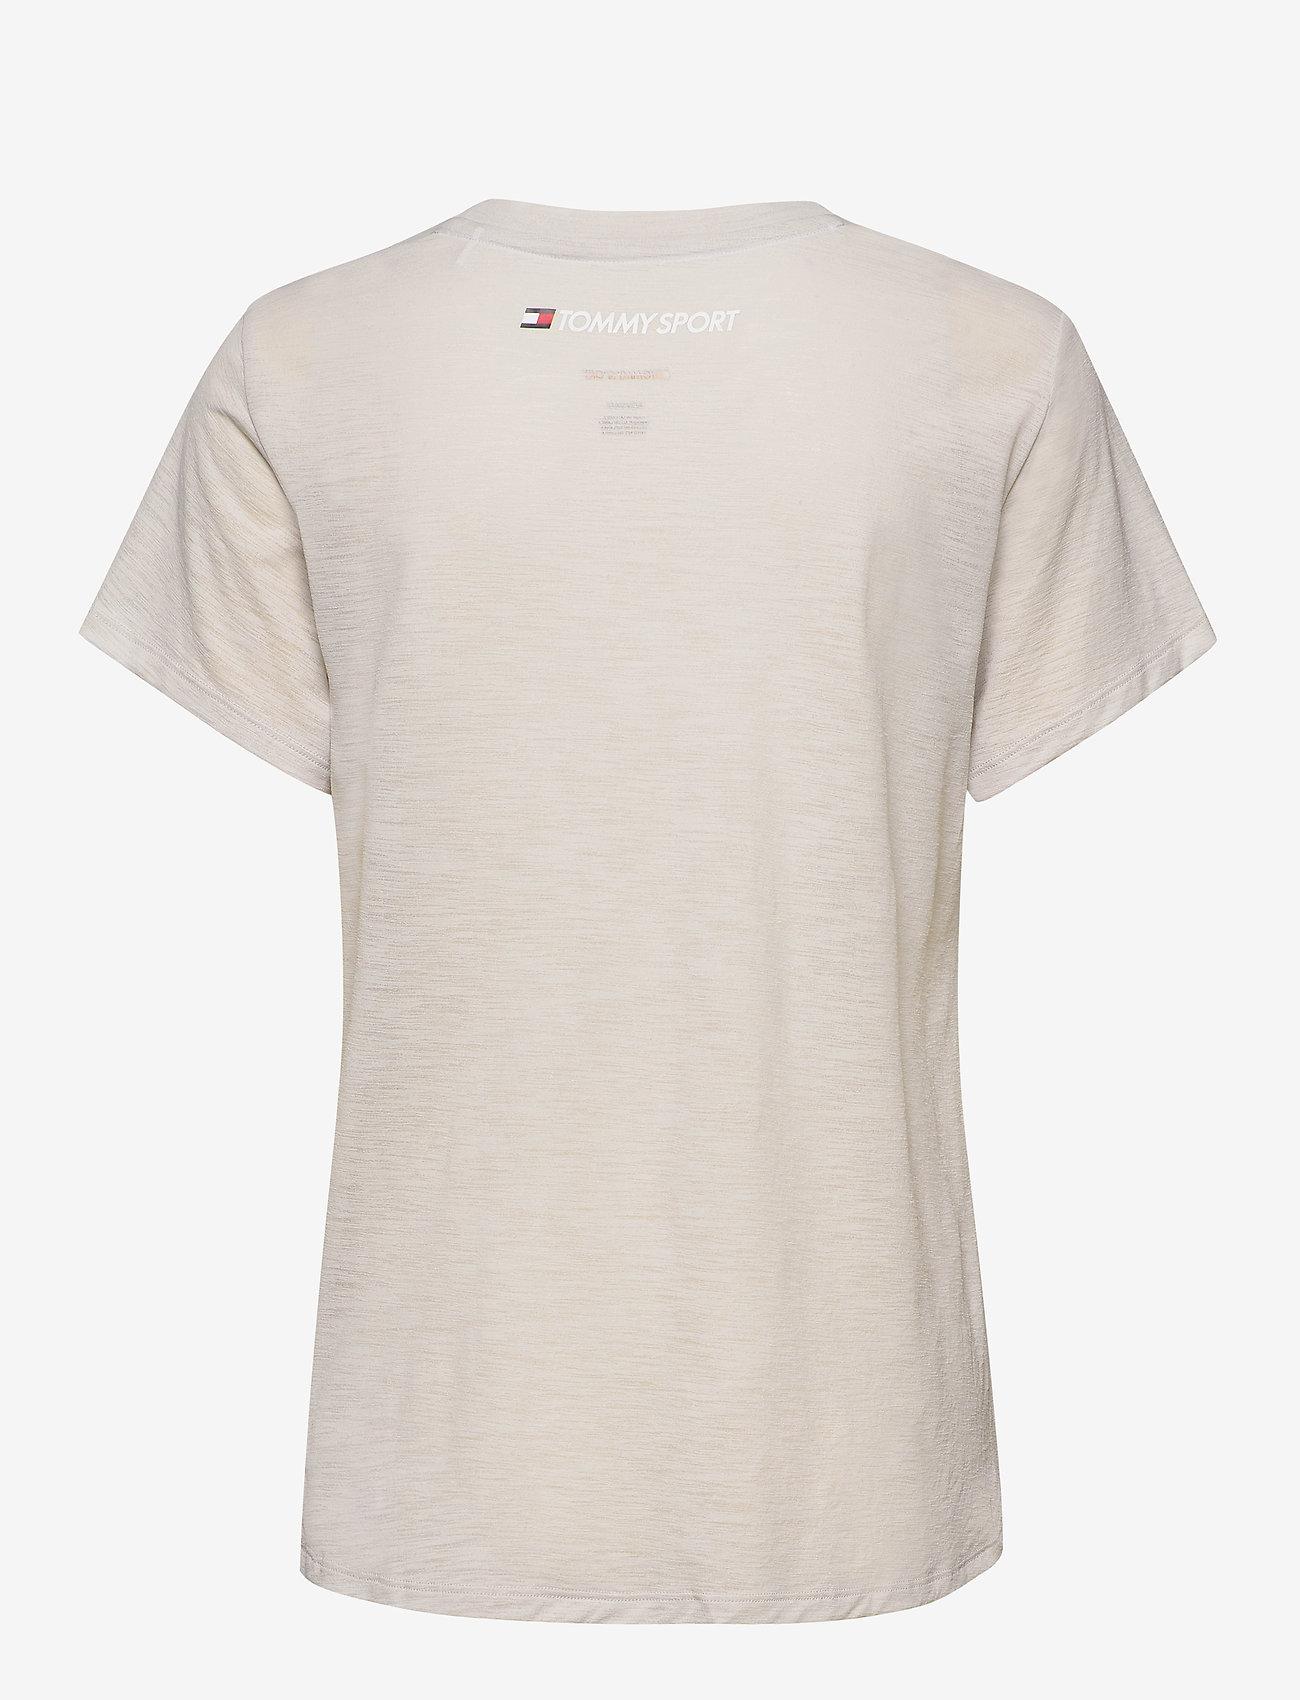 Tommy Sport - PERFORMANCE LBR TOP - t-shirts - light cast - 1